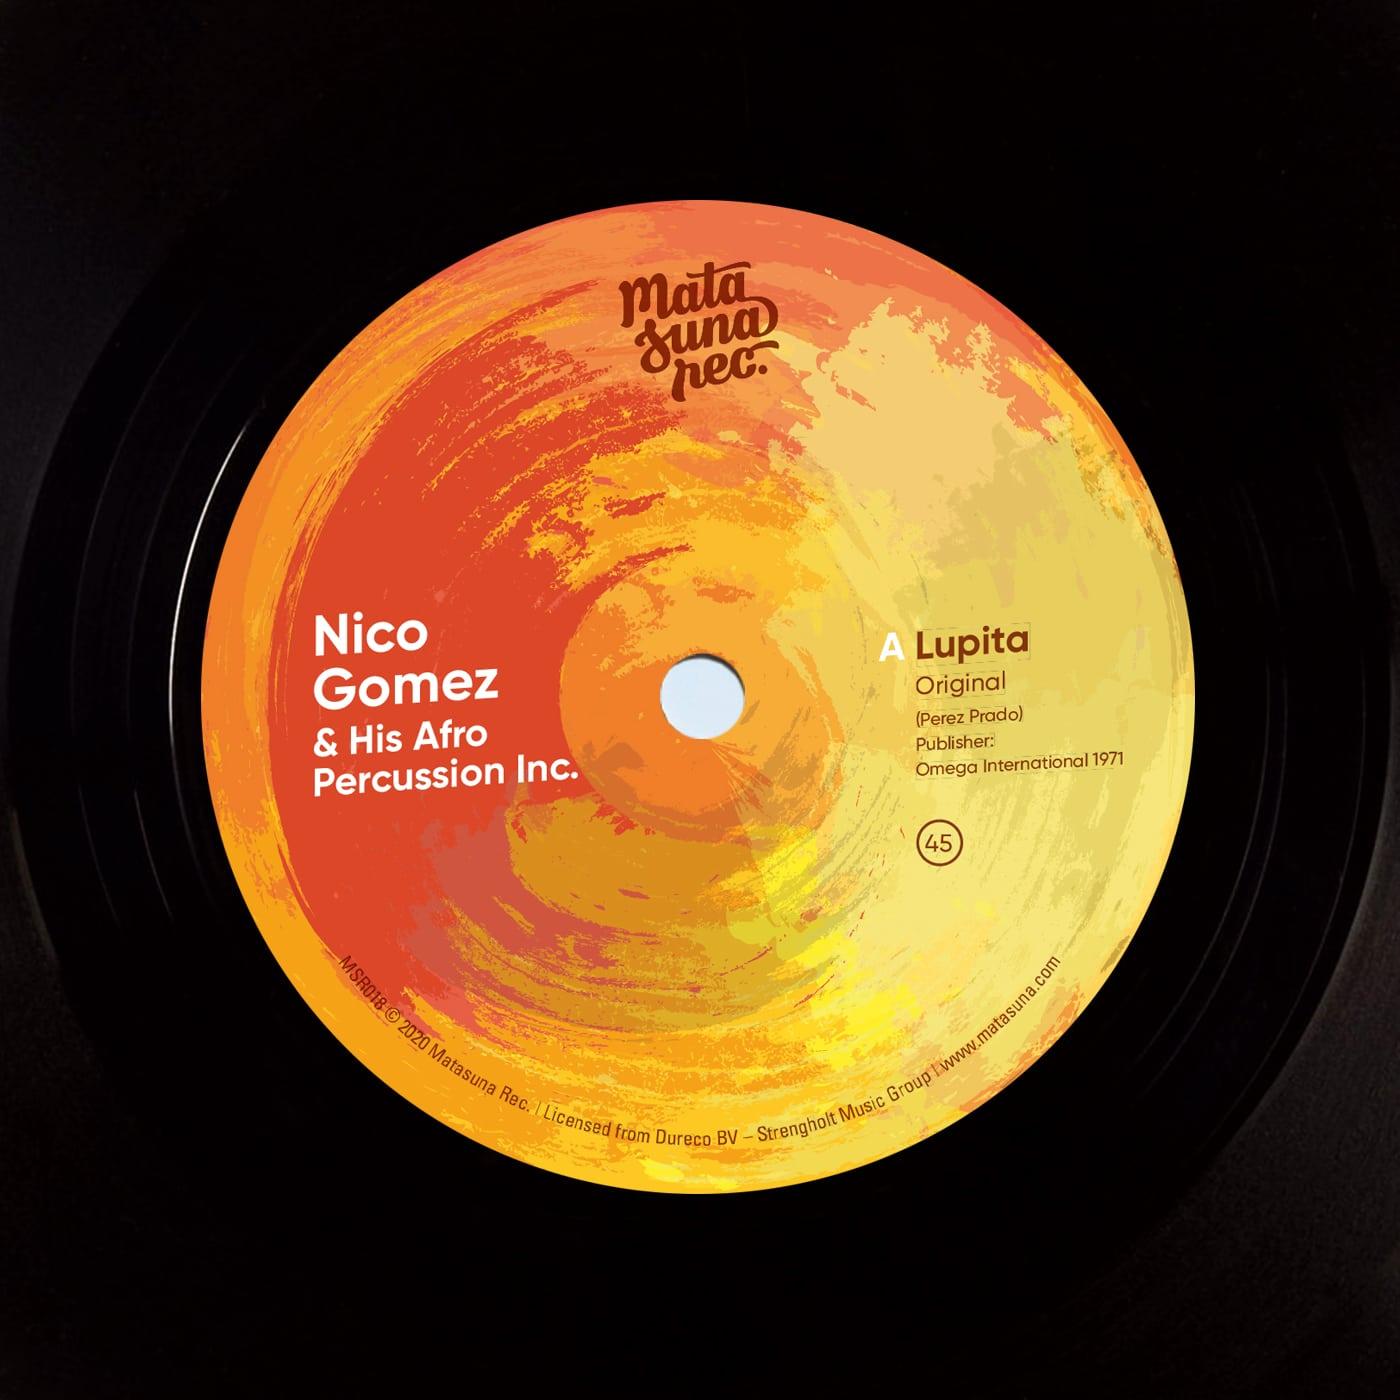 [MSR018] Nico Gomez - Lupita